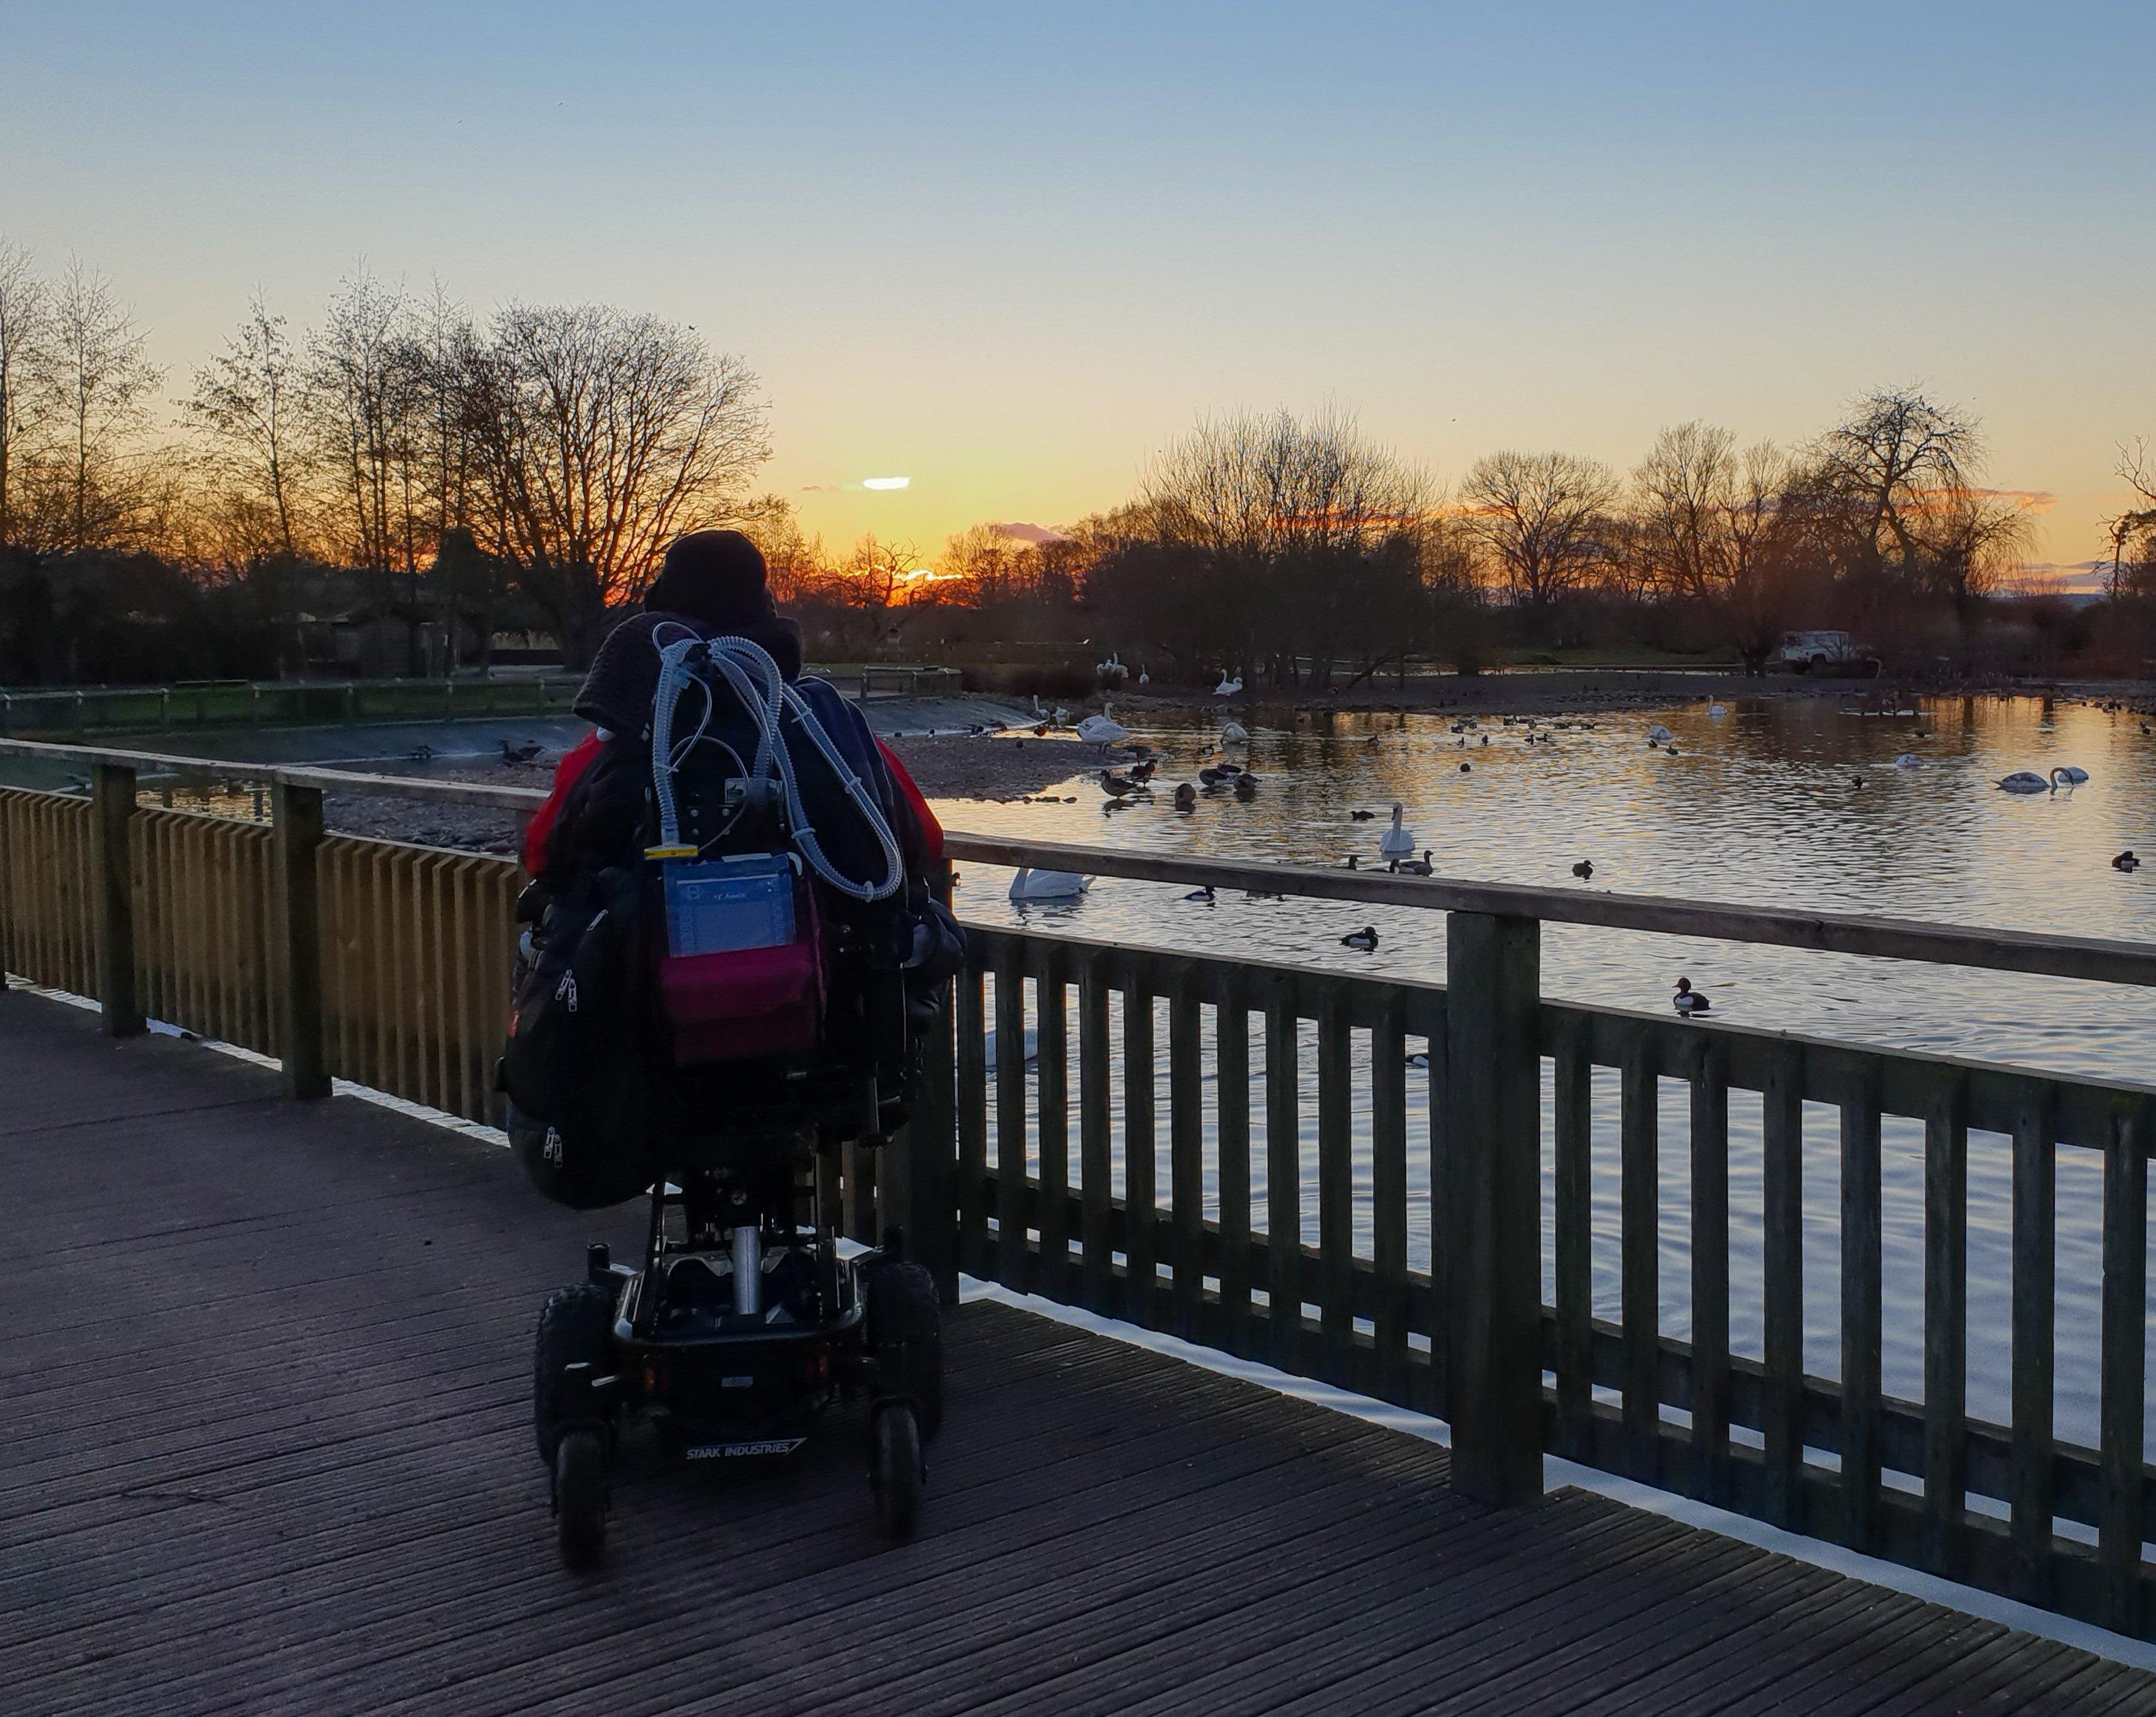 Daniel Baker looking over a lake towards a sunset at WWT Slimbridge